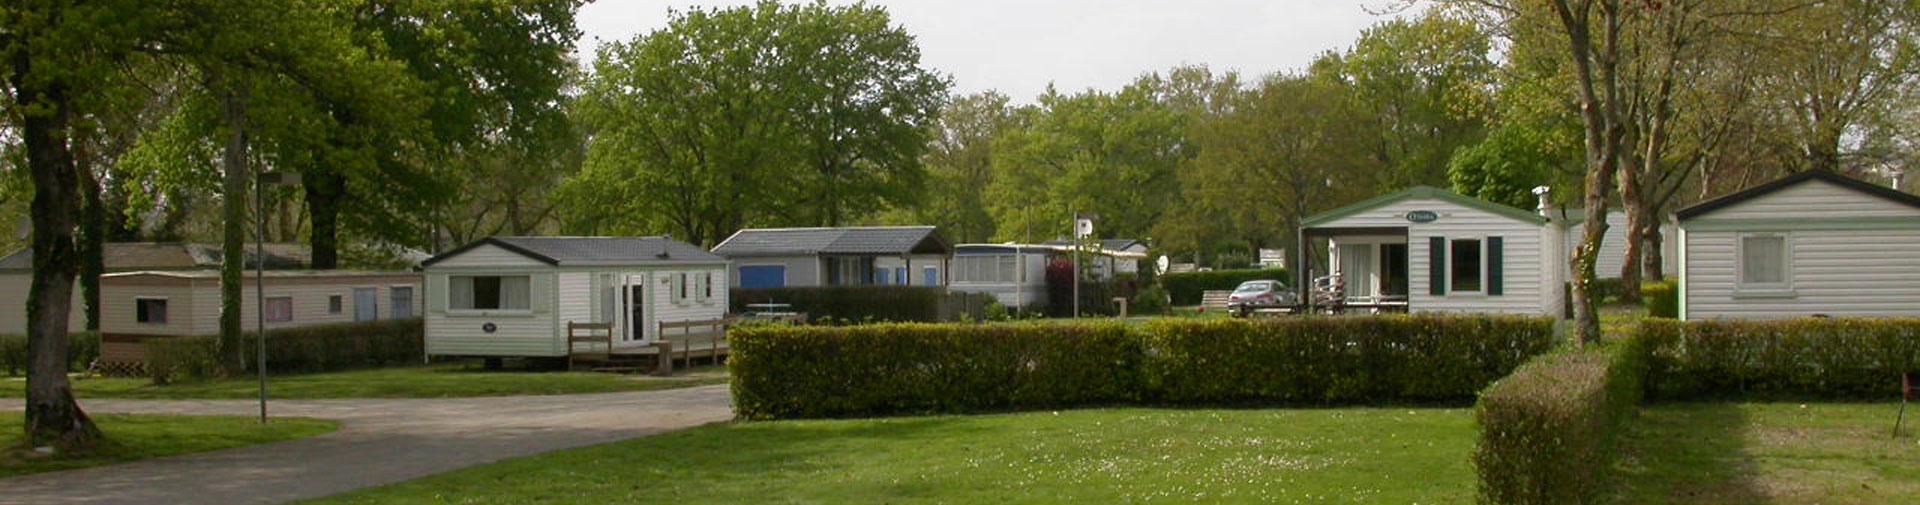 location-mobil-home-camping-du-lac-bain-de-bretagne